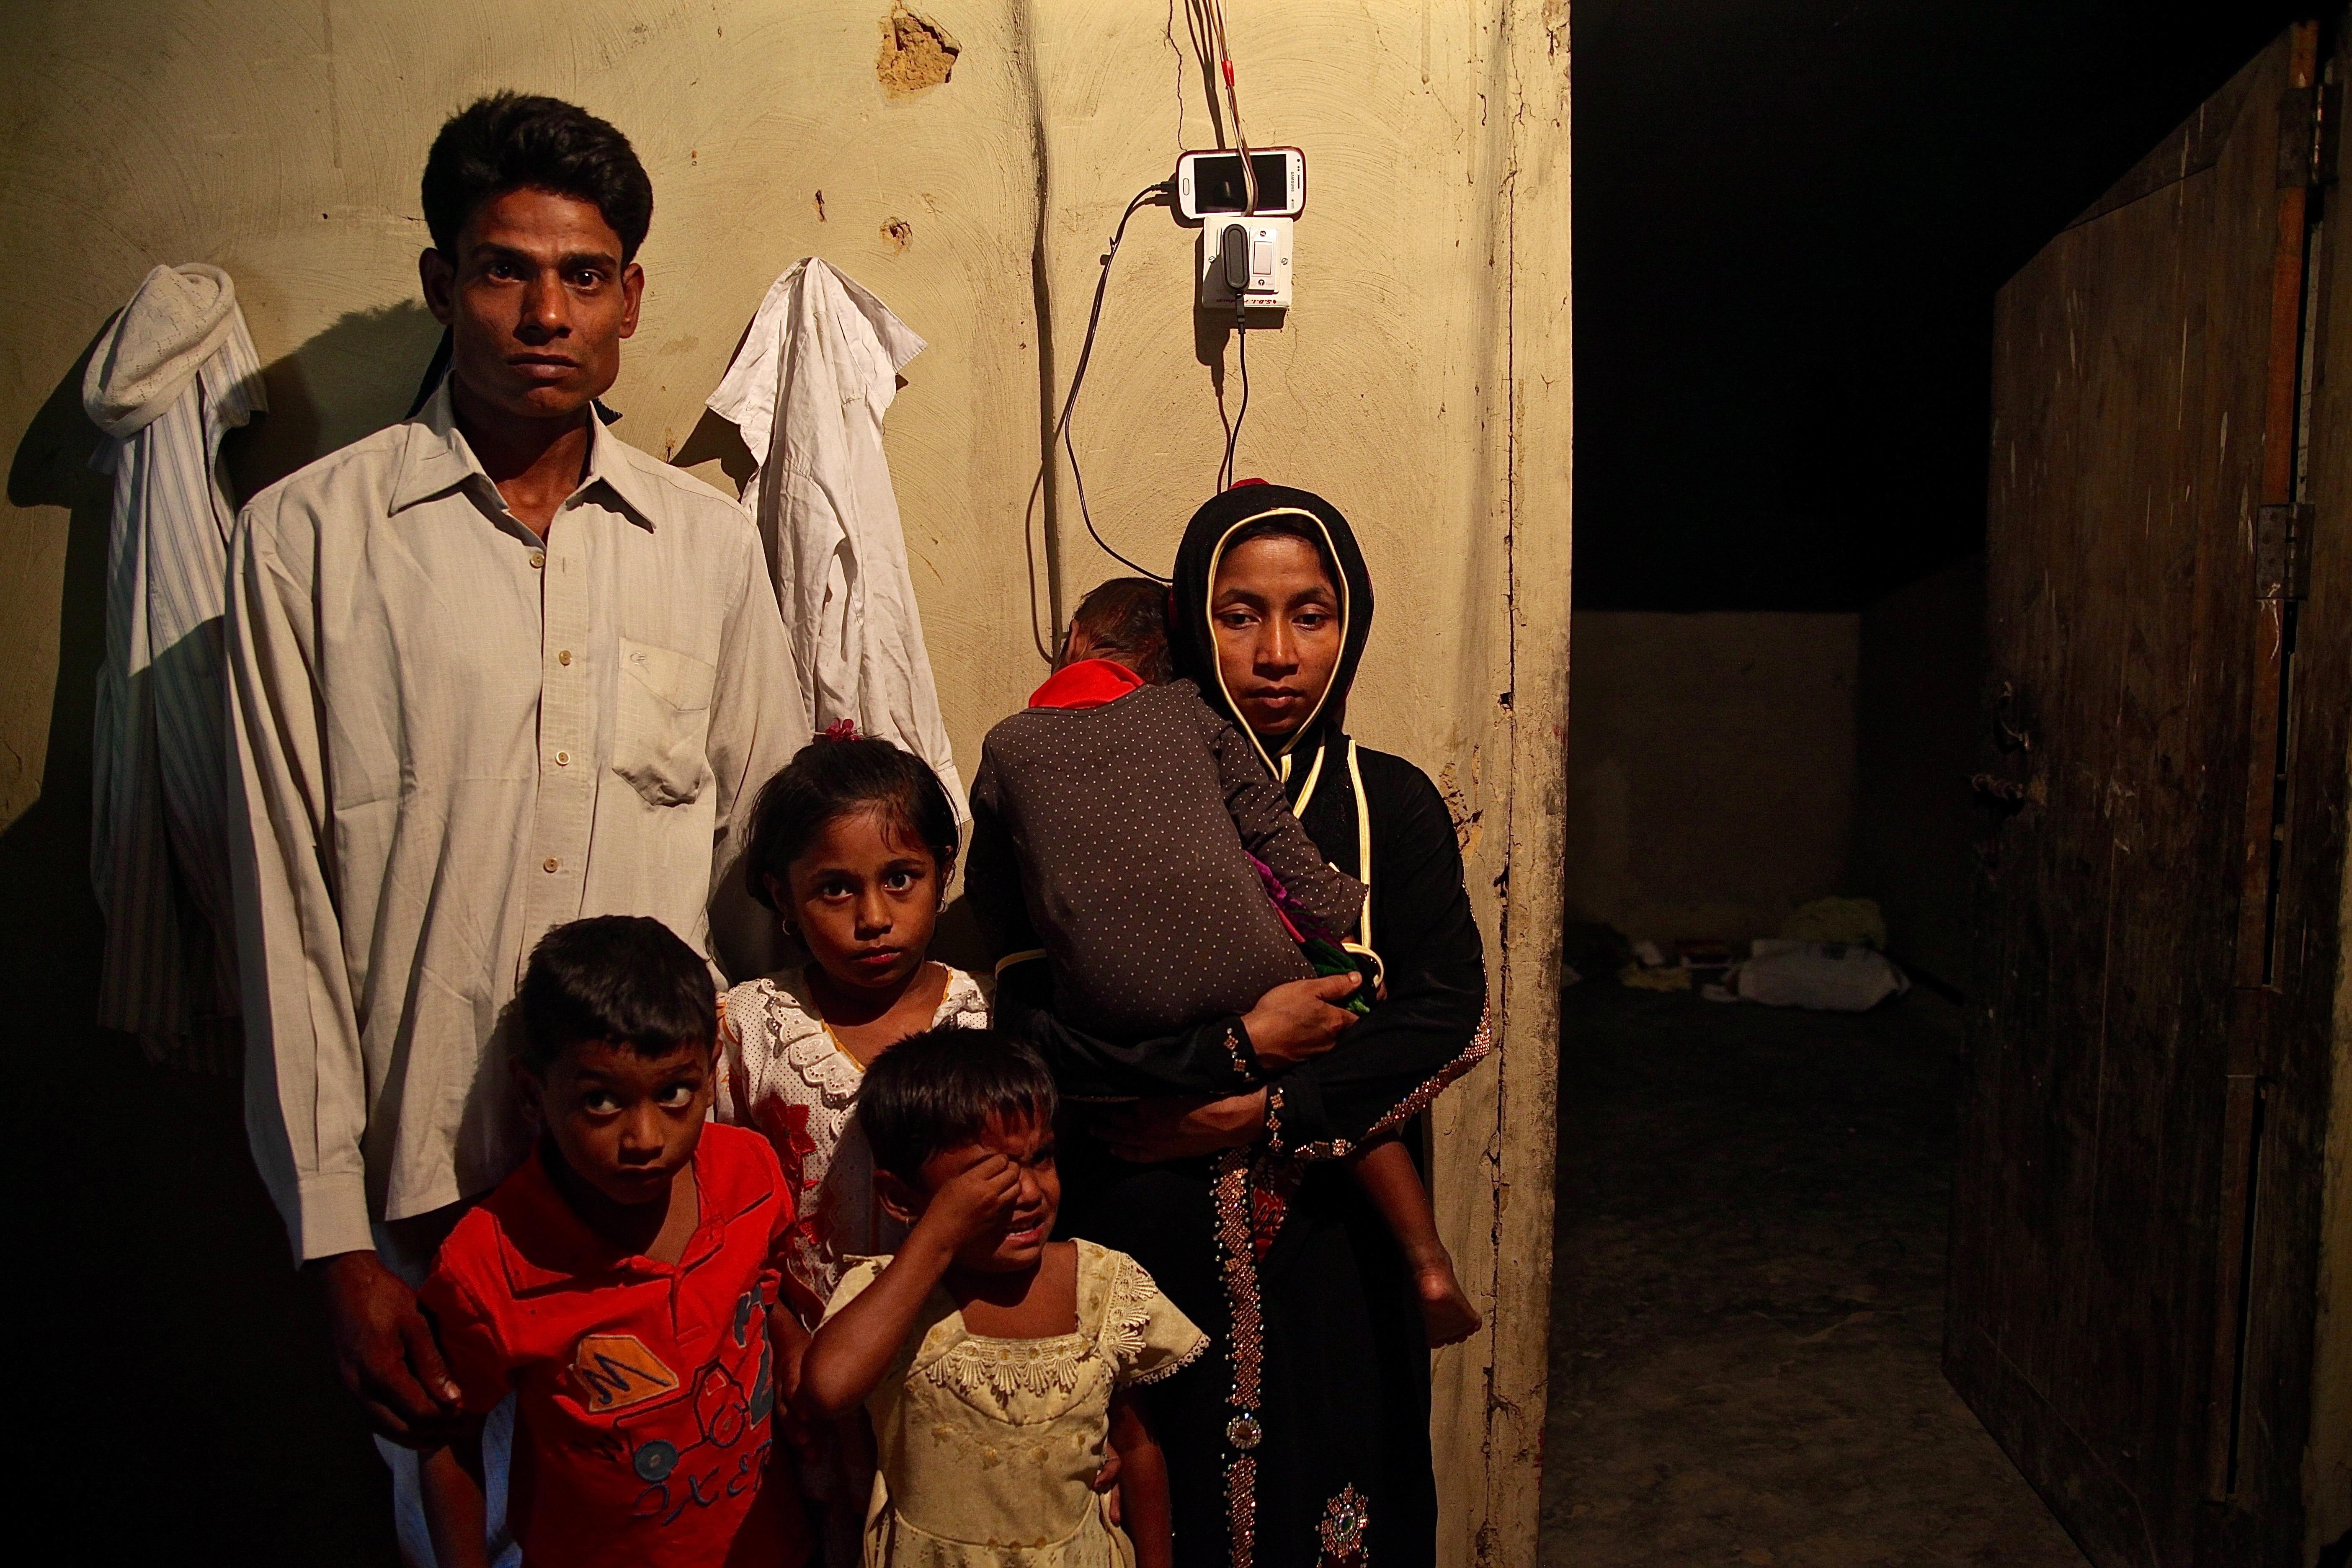 A Rohingya family